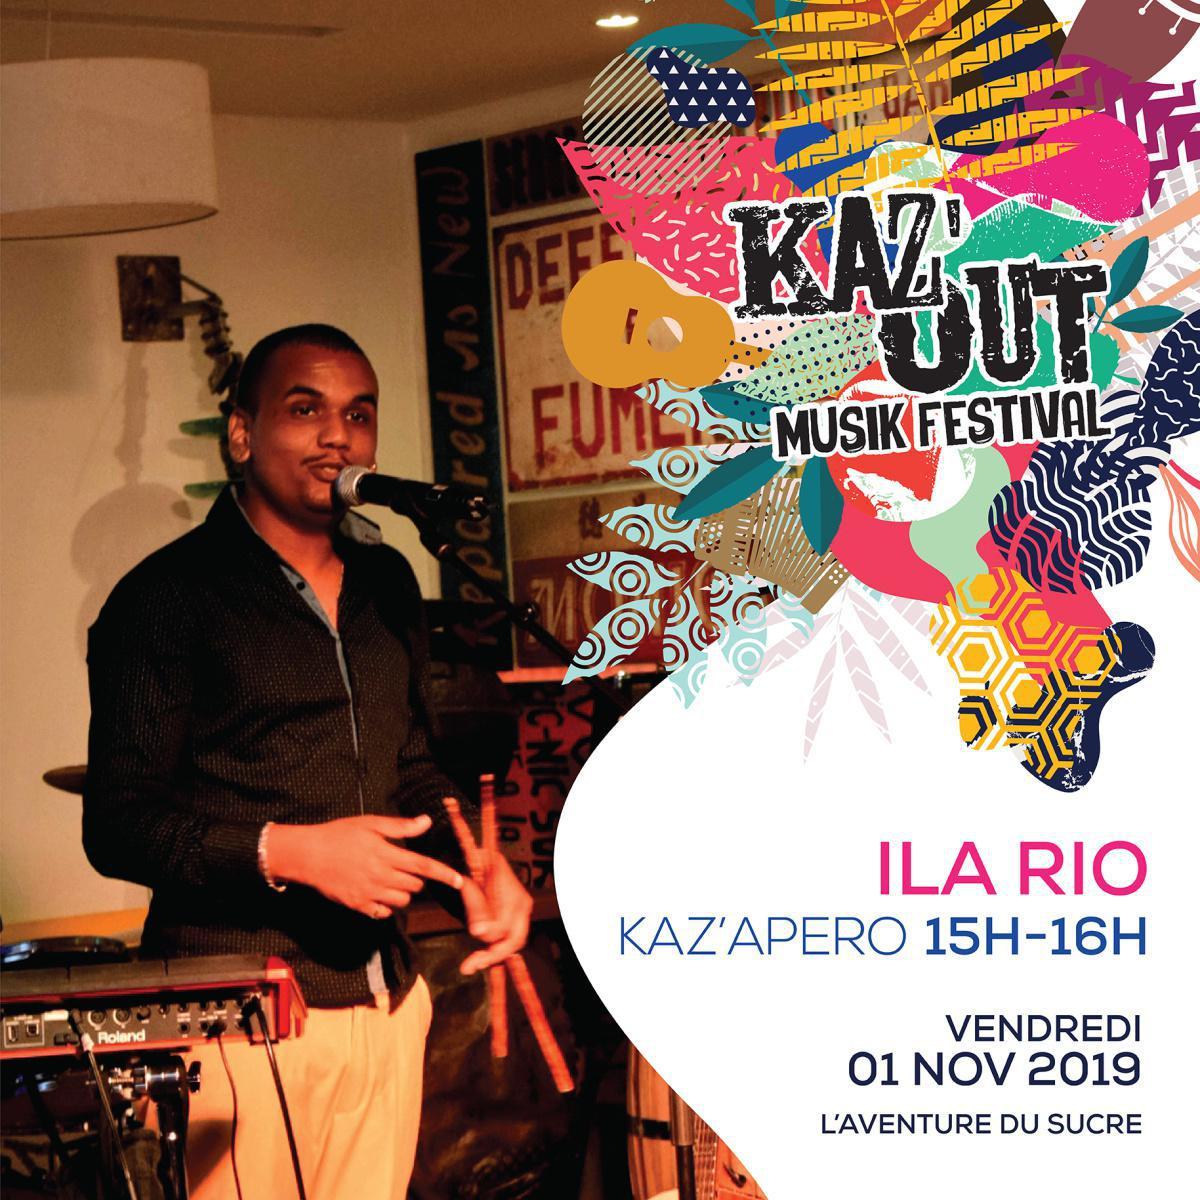 Kaz'Out - A Sneak Peek into A Breathtaking Artist Line-Up